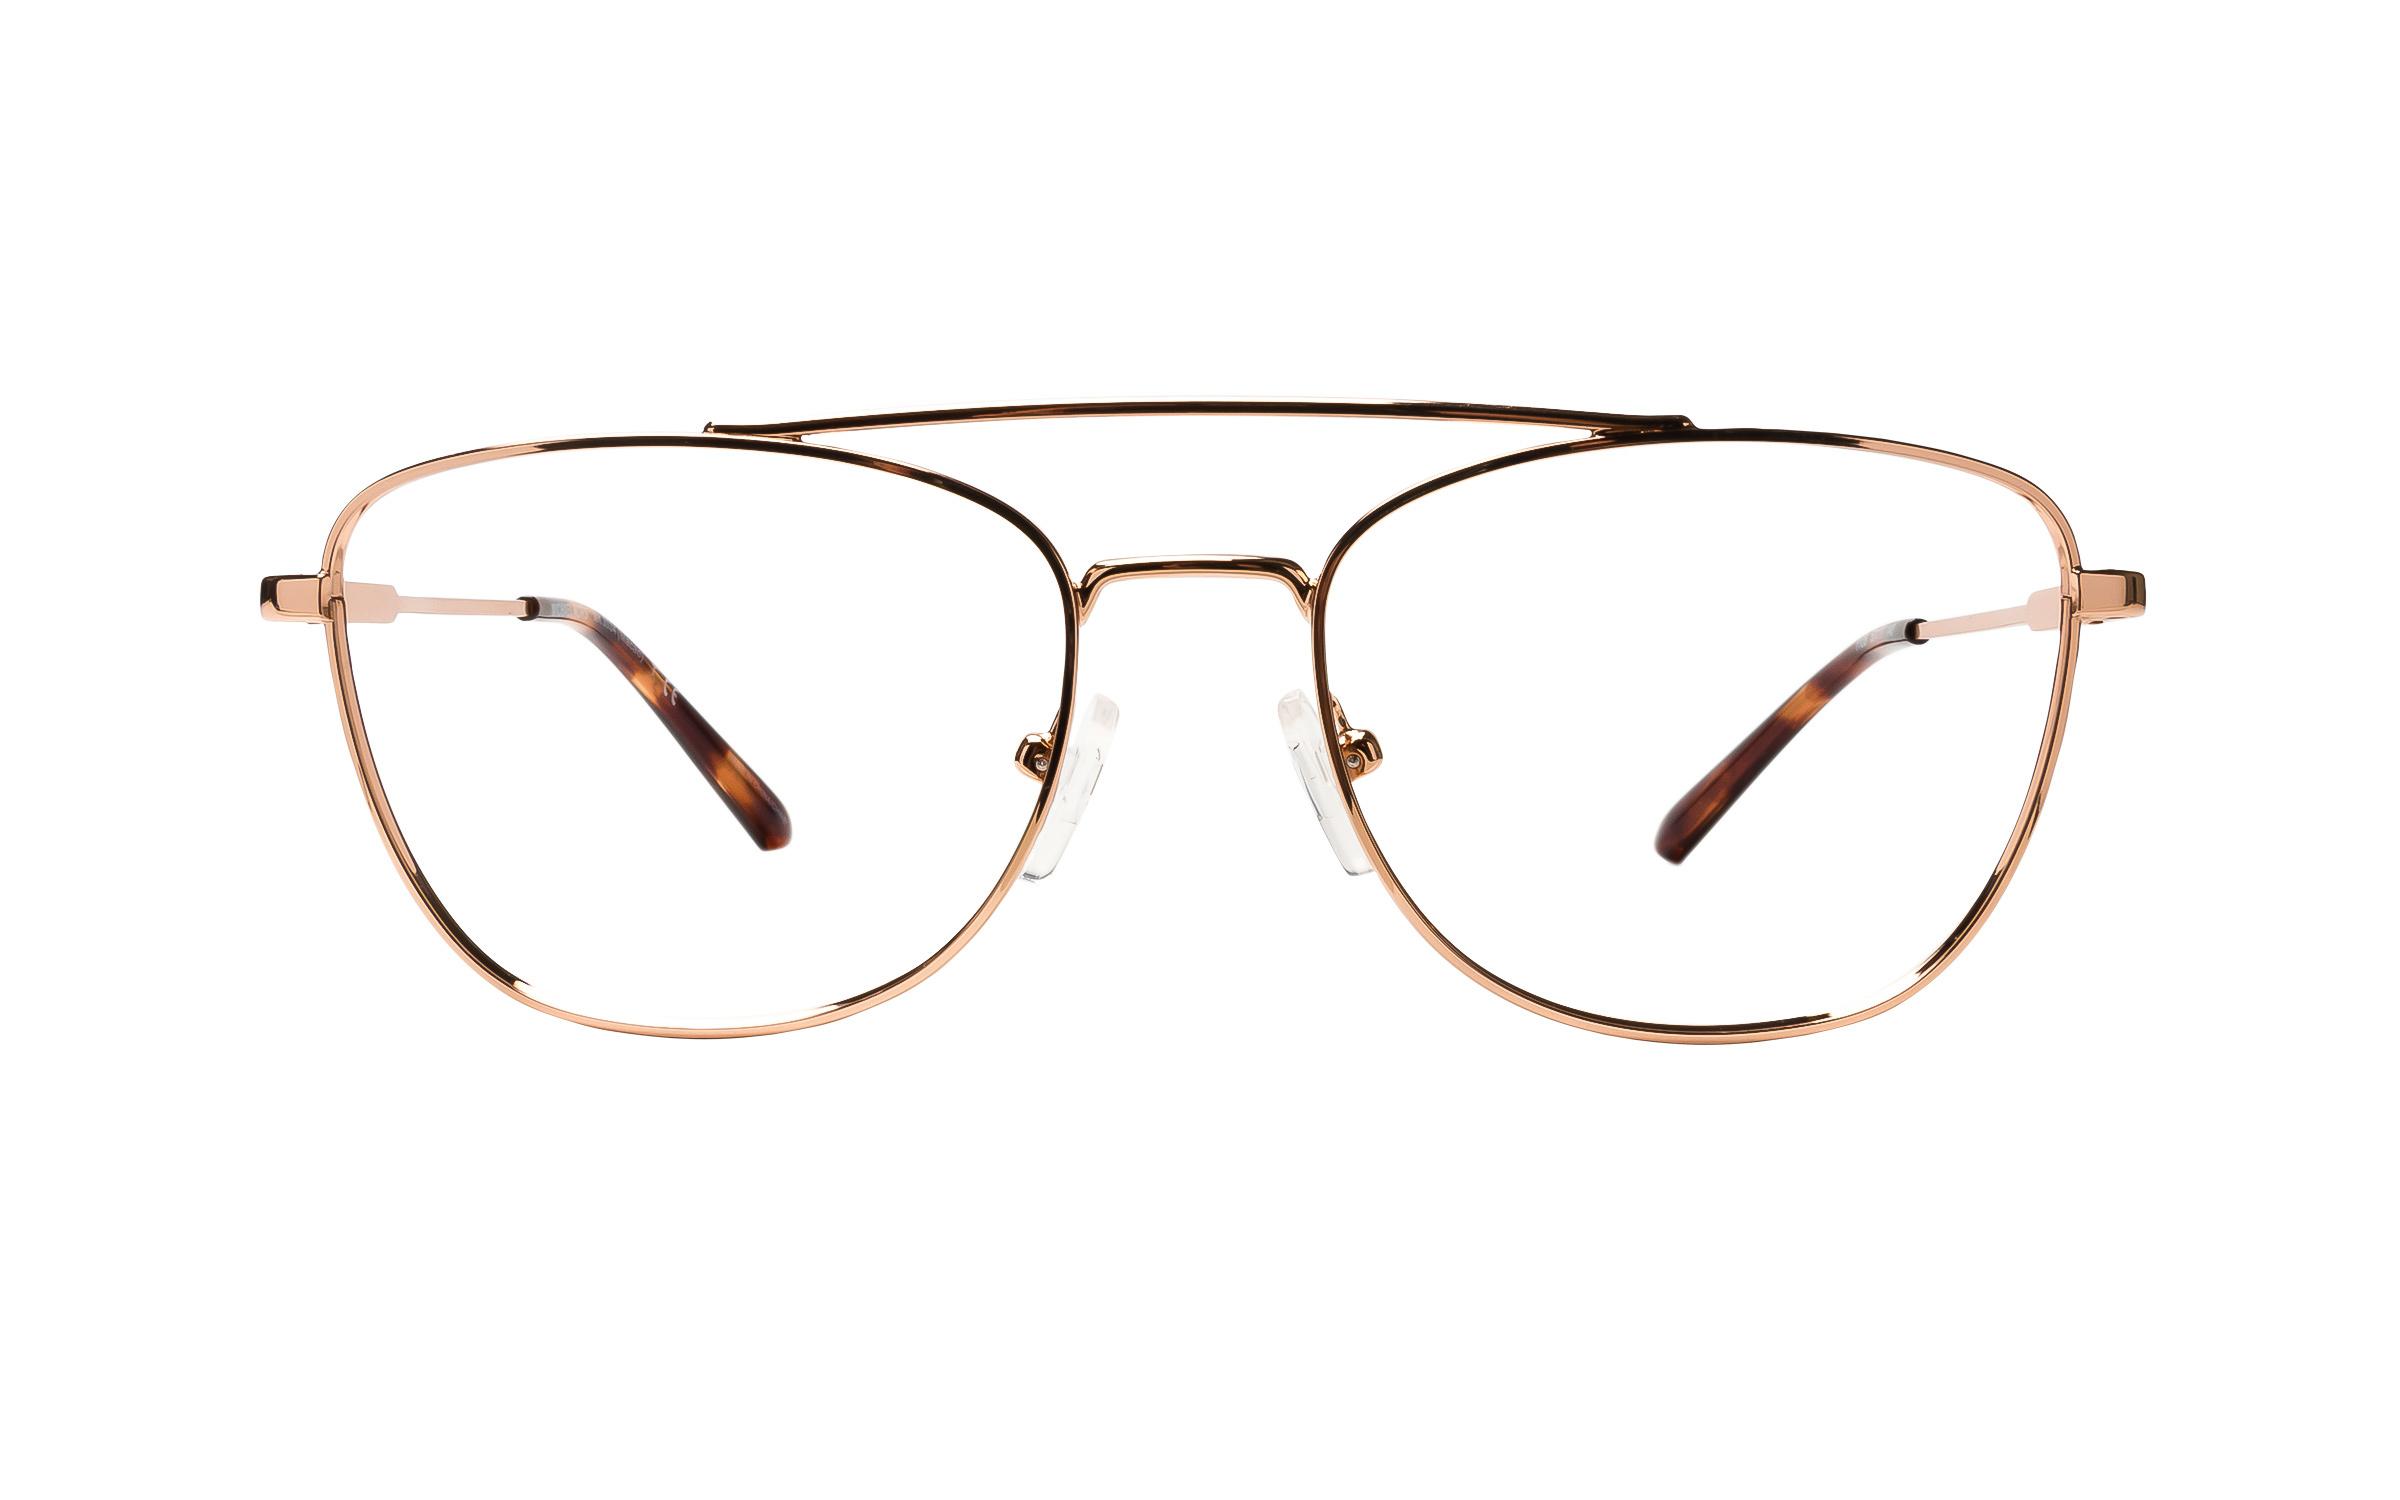 Michael Kors Macao MK3034 1108 (53) Eyeglasses and Frame in Rose Gold/Pink | Plastic/Metal - Online Coastal